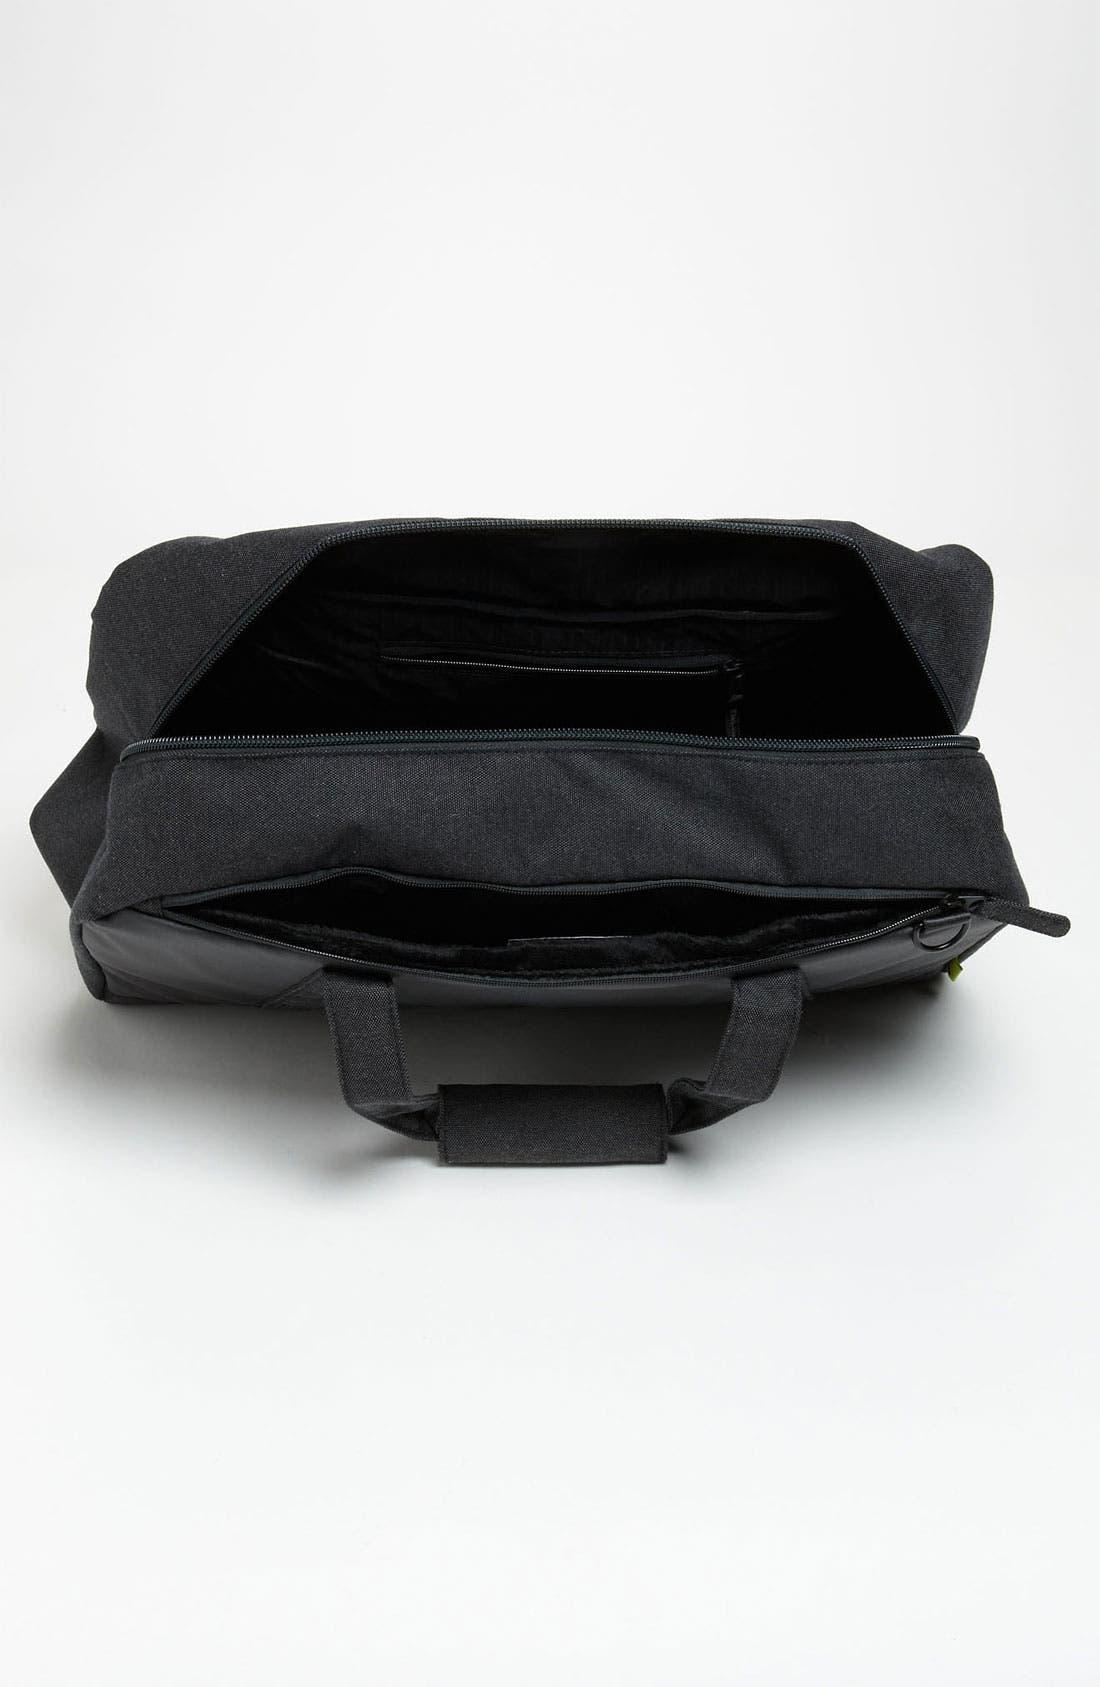 Incase 'EO' Travel Duffel Bag,                             Alternate thumbnail 2, color,                             001